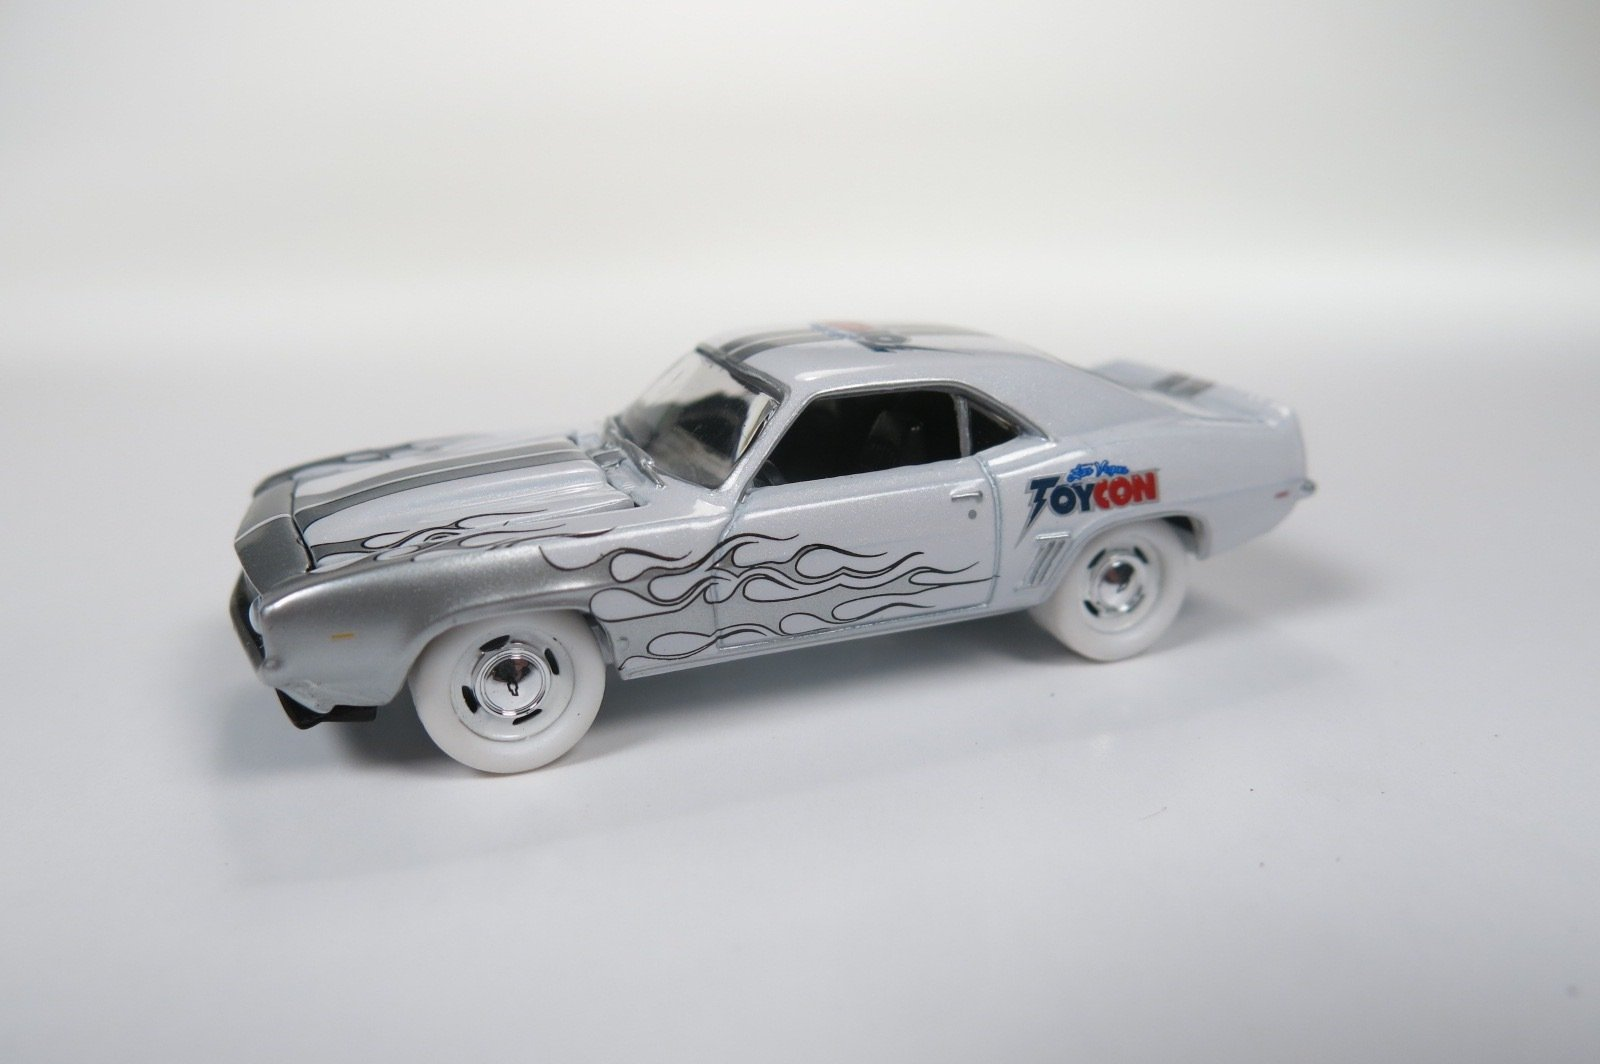 Johnny Lightning 1st ever VegasToyCon Exclusive 1969 Camaro 48 Count Case Guaranteed White Lightning